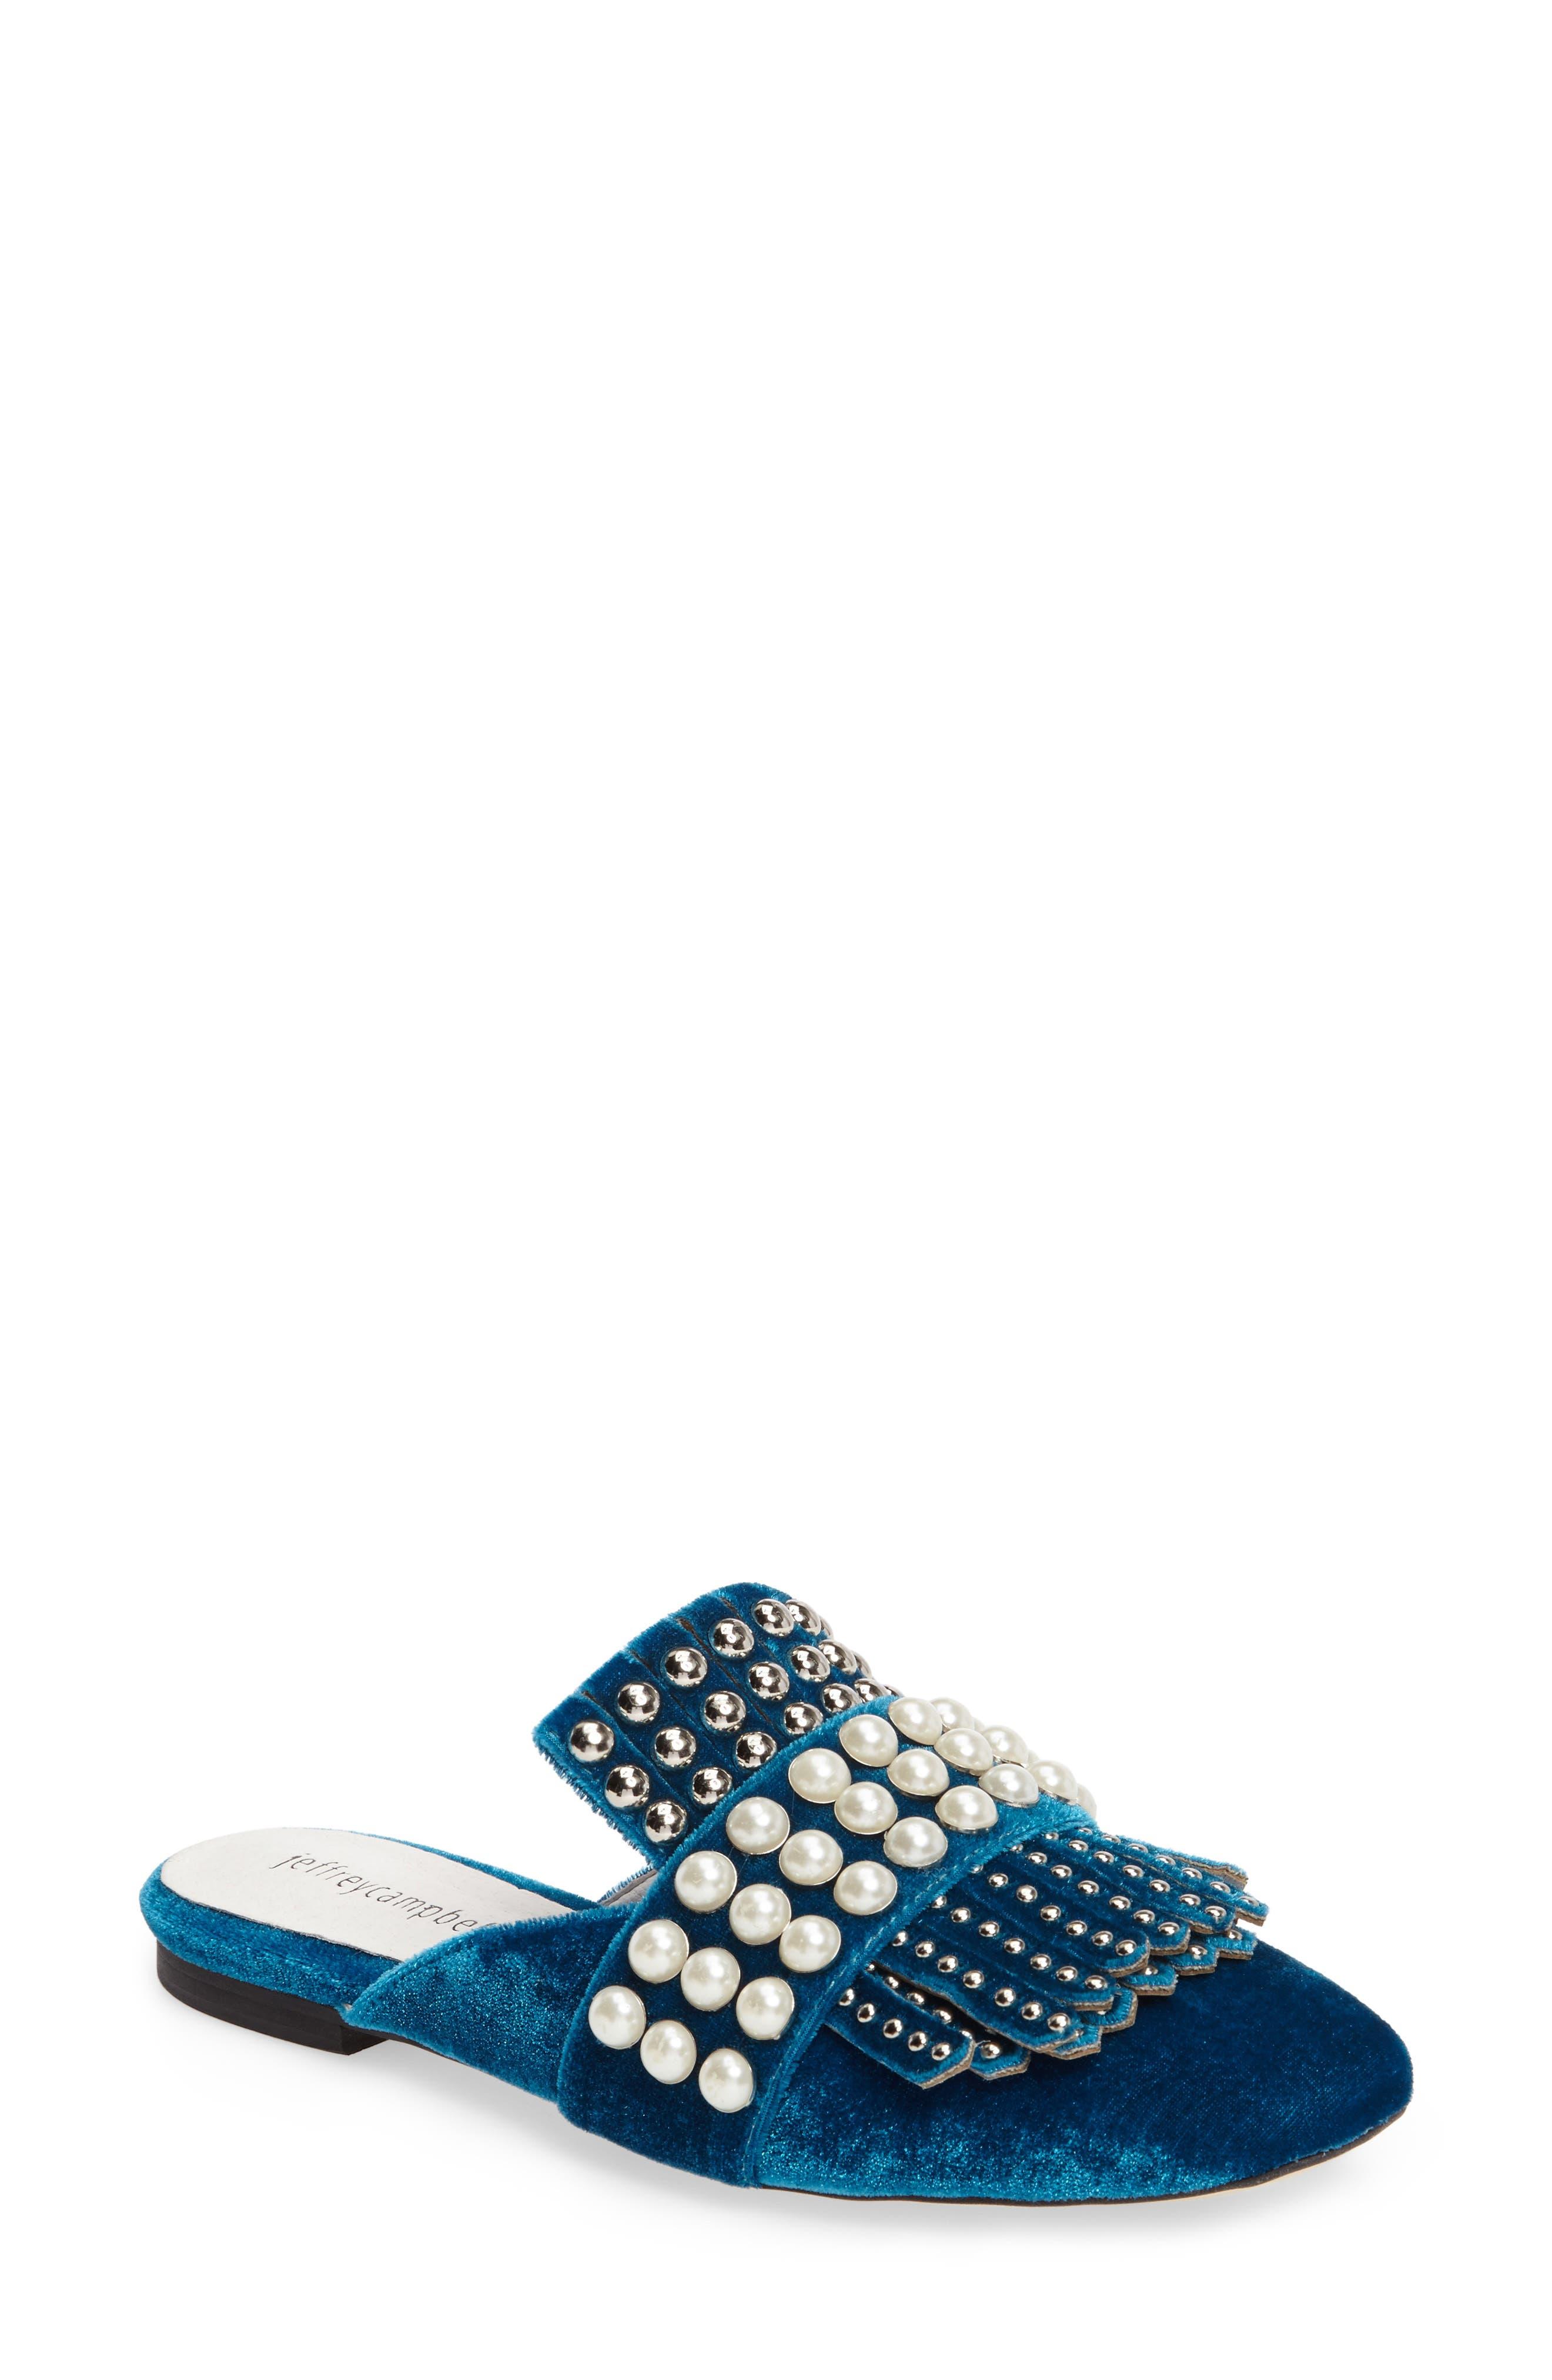 Main Image - Jeffrey Campbell Ravis Embellished Loafer Mule (Women)